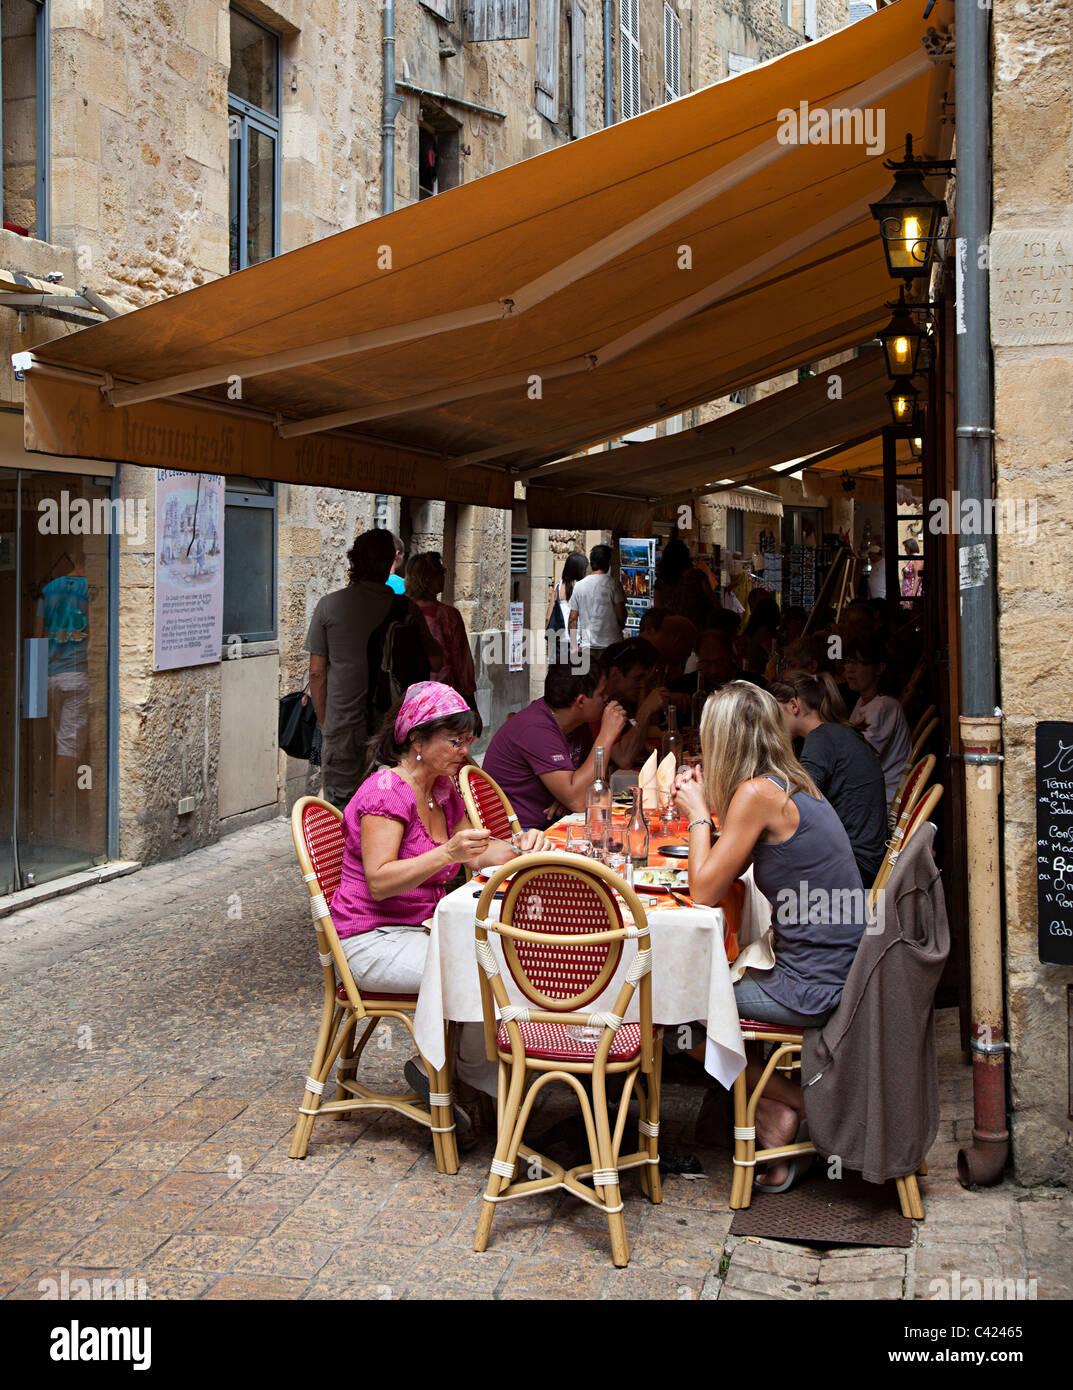 People eating at tables under awning Sarlat-la-Caneda Dordogne France - Stock Image